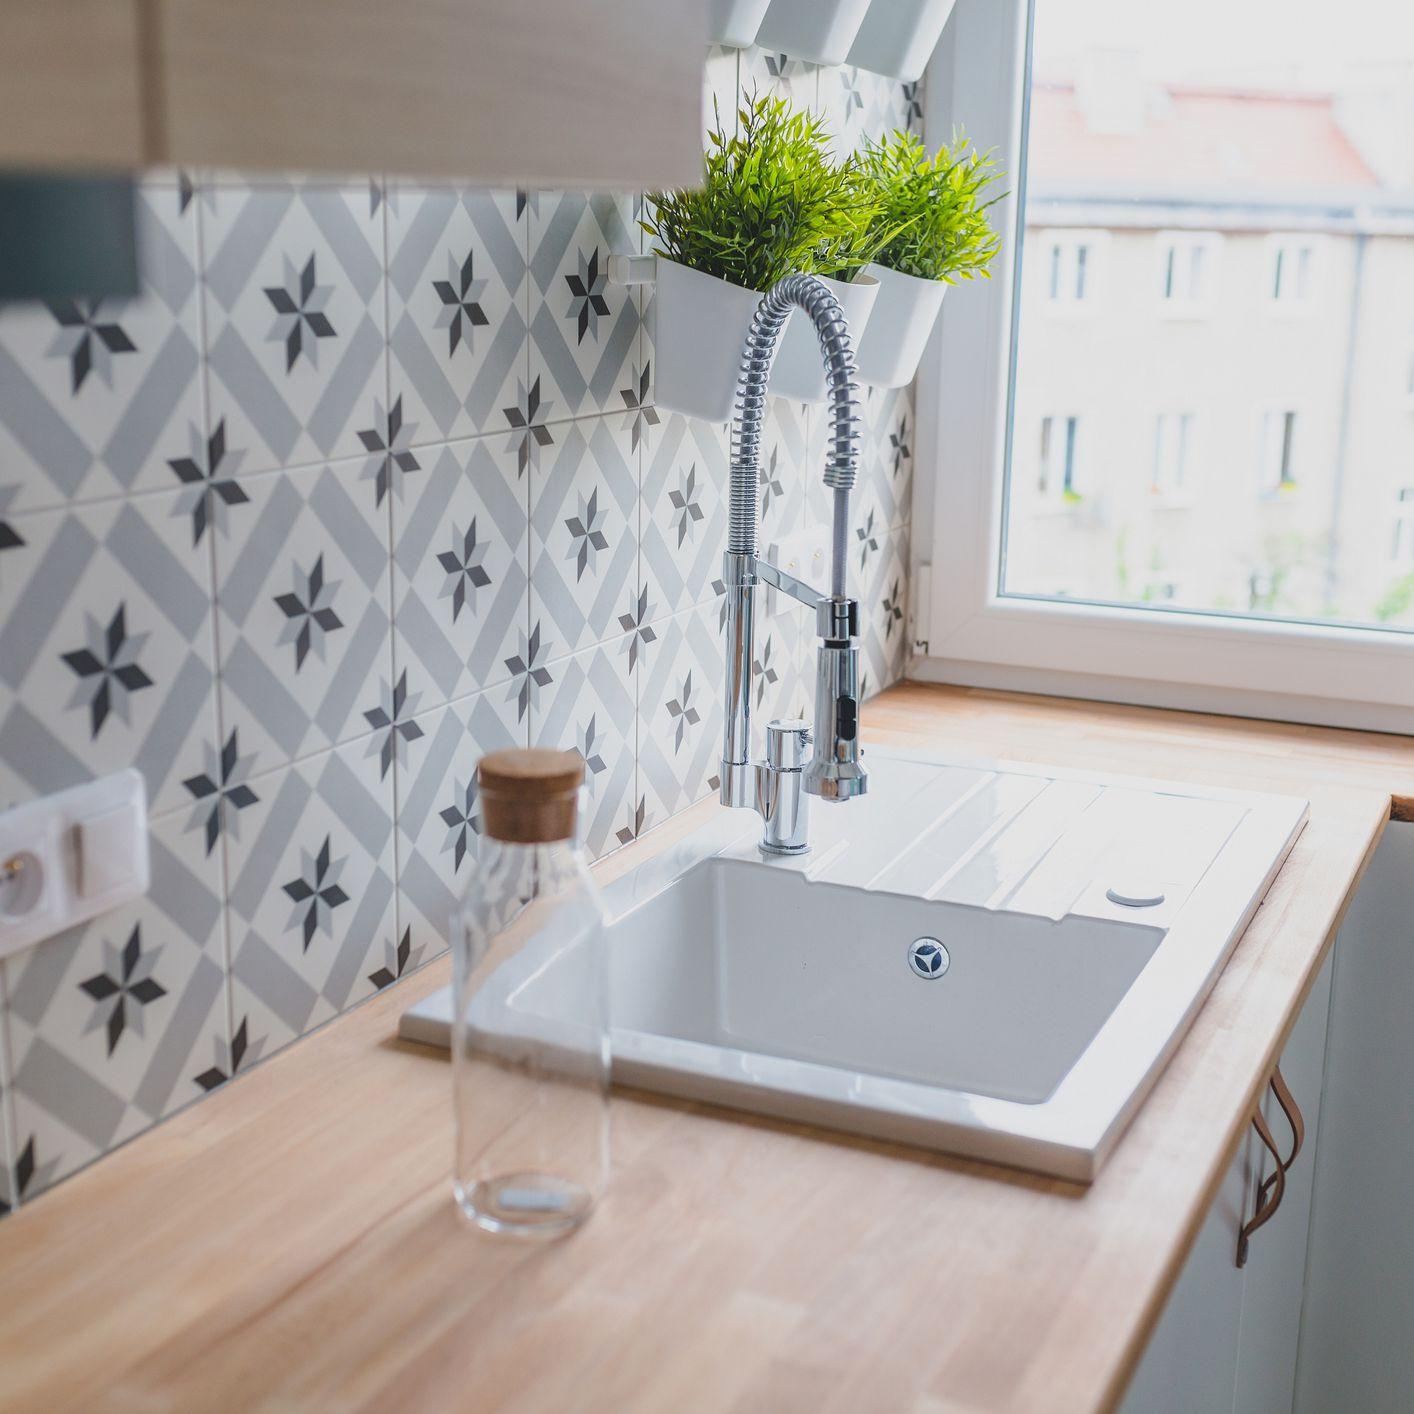 - Adhesive Tile Mat Backsplash Pros And Cons